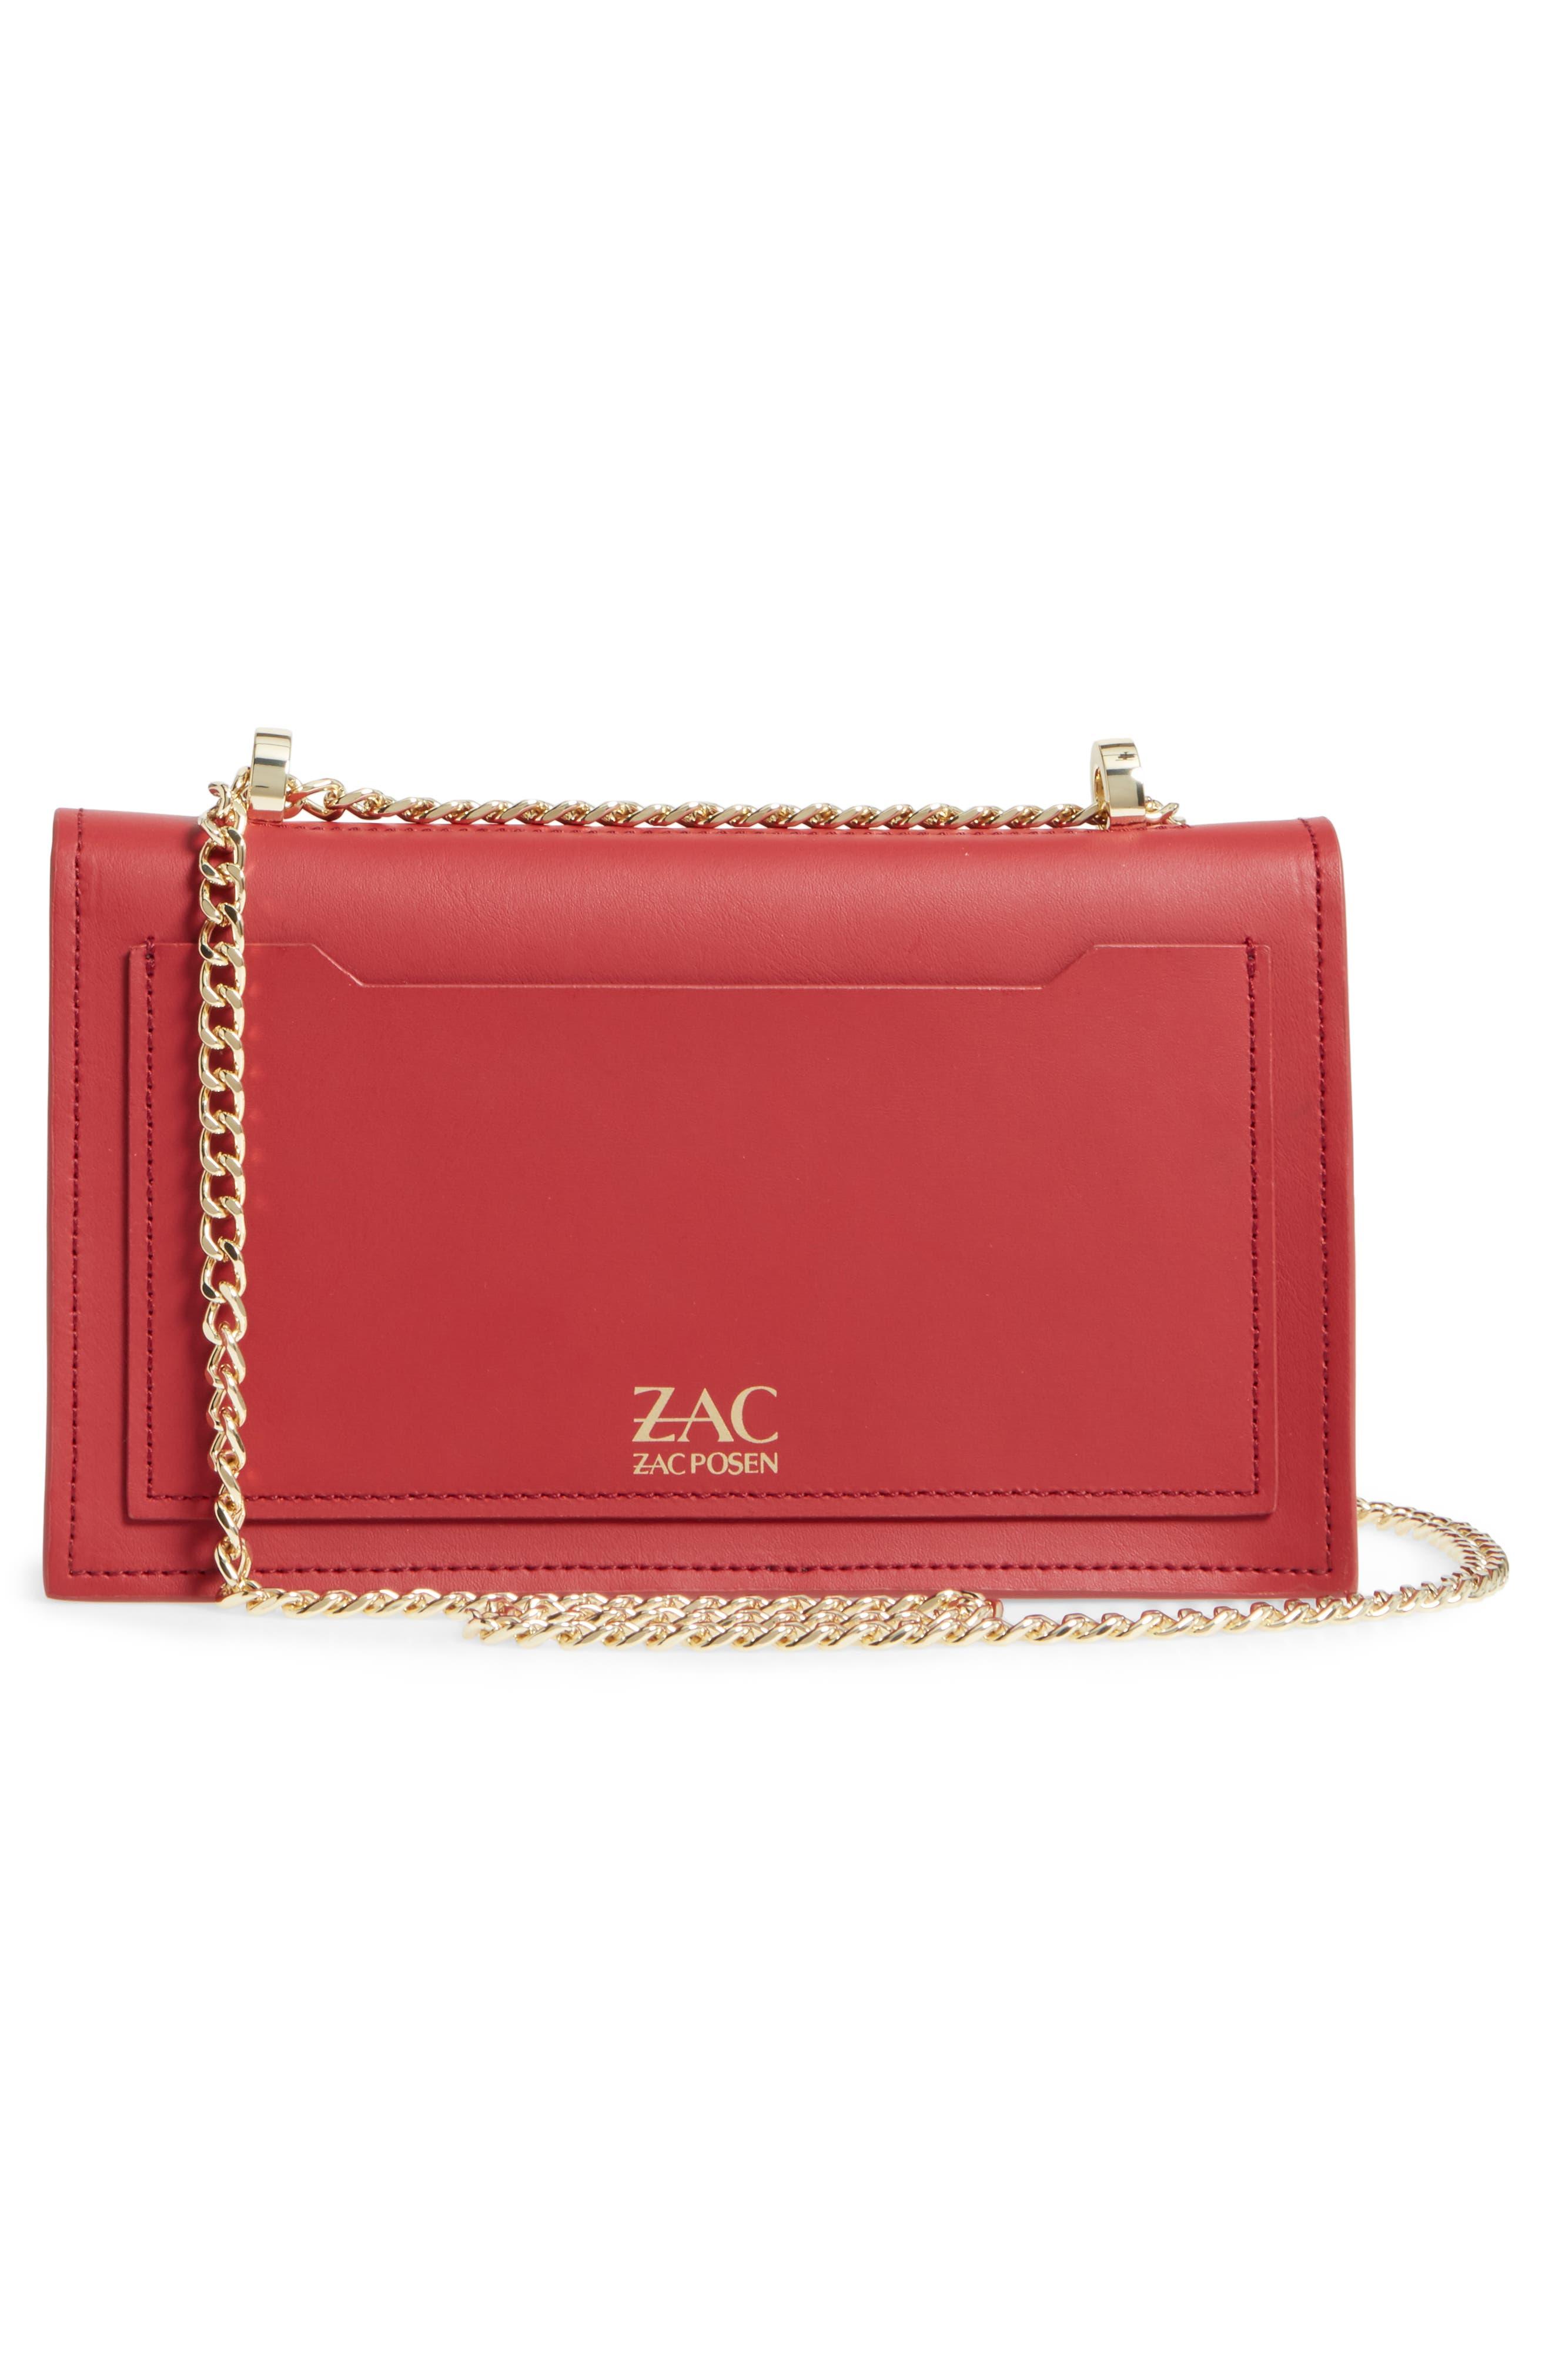 ZAC Zac Posen Earthette Leather Accordion Bag,                             Alternate thumbnail 3, color,                             Red